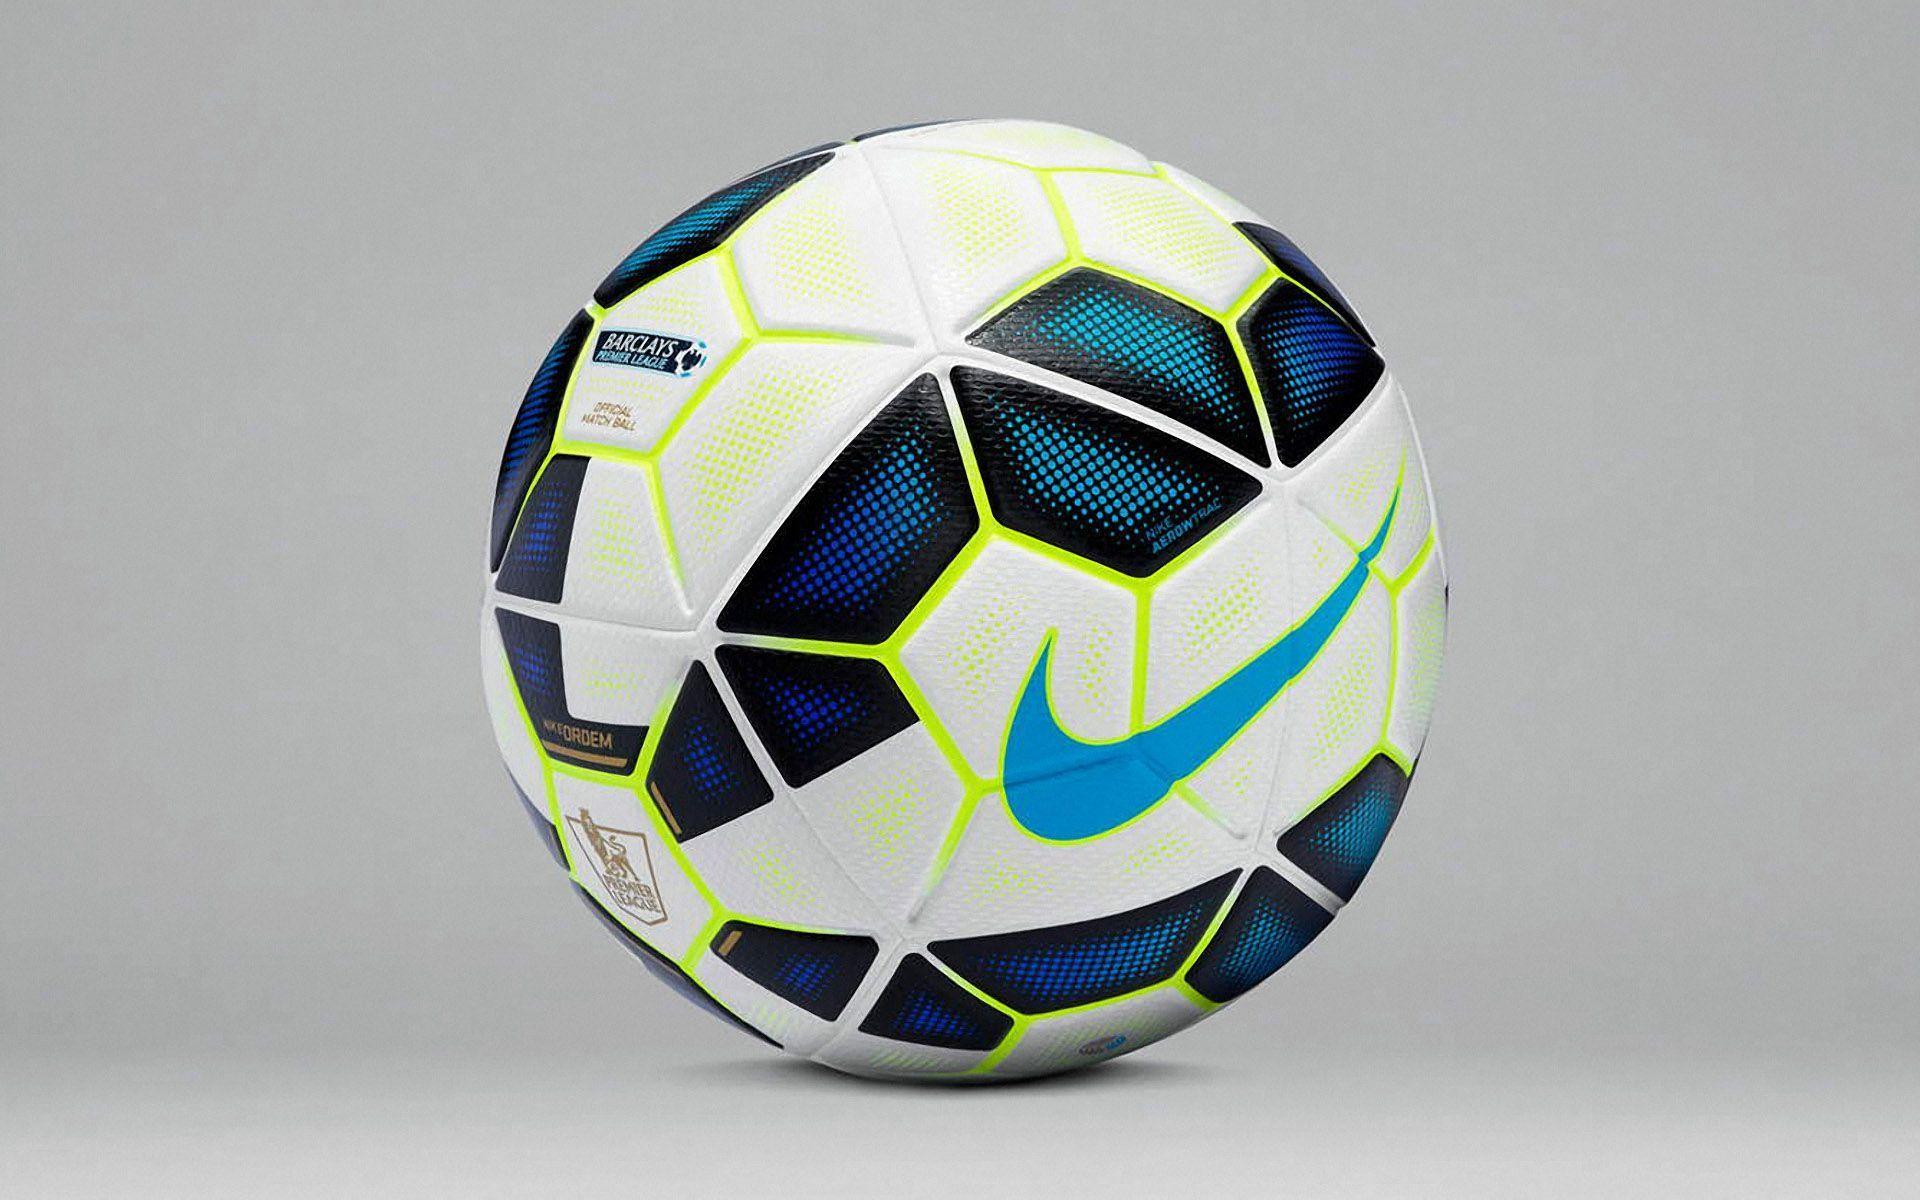 9ine Nikesoccerballs Balón De Fútbol Nike Nike Fútbol Balones